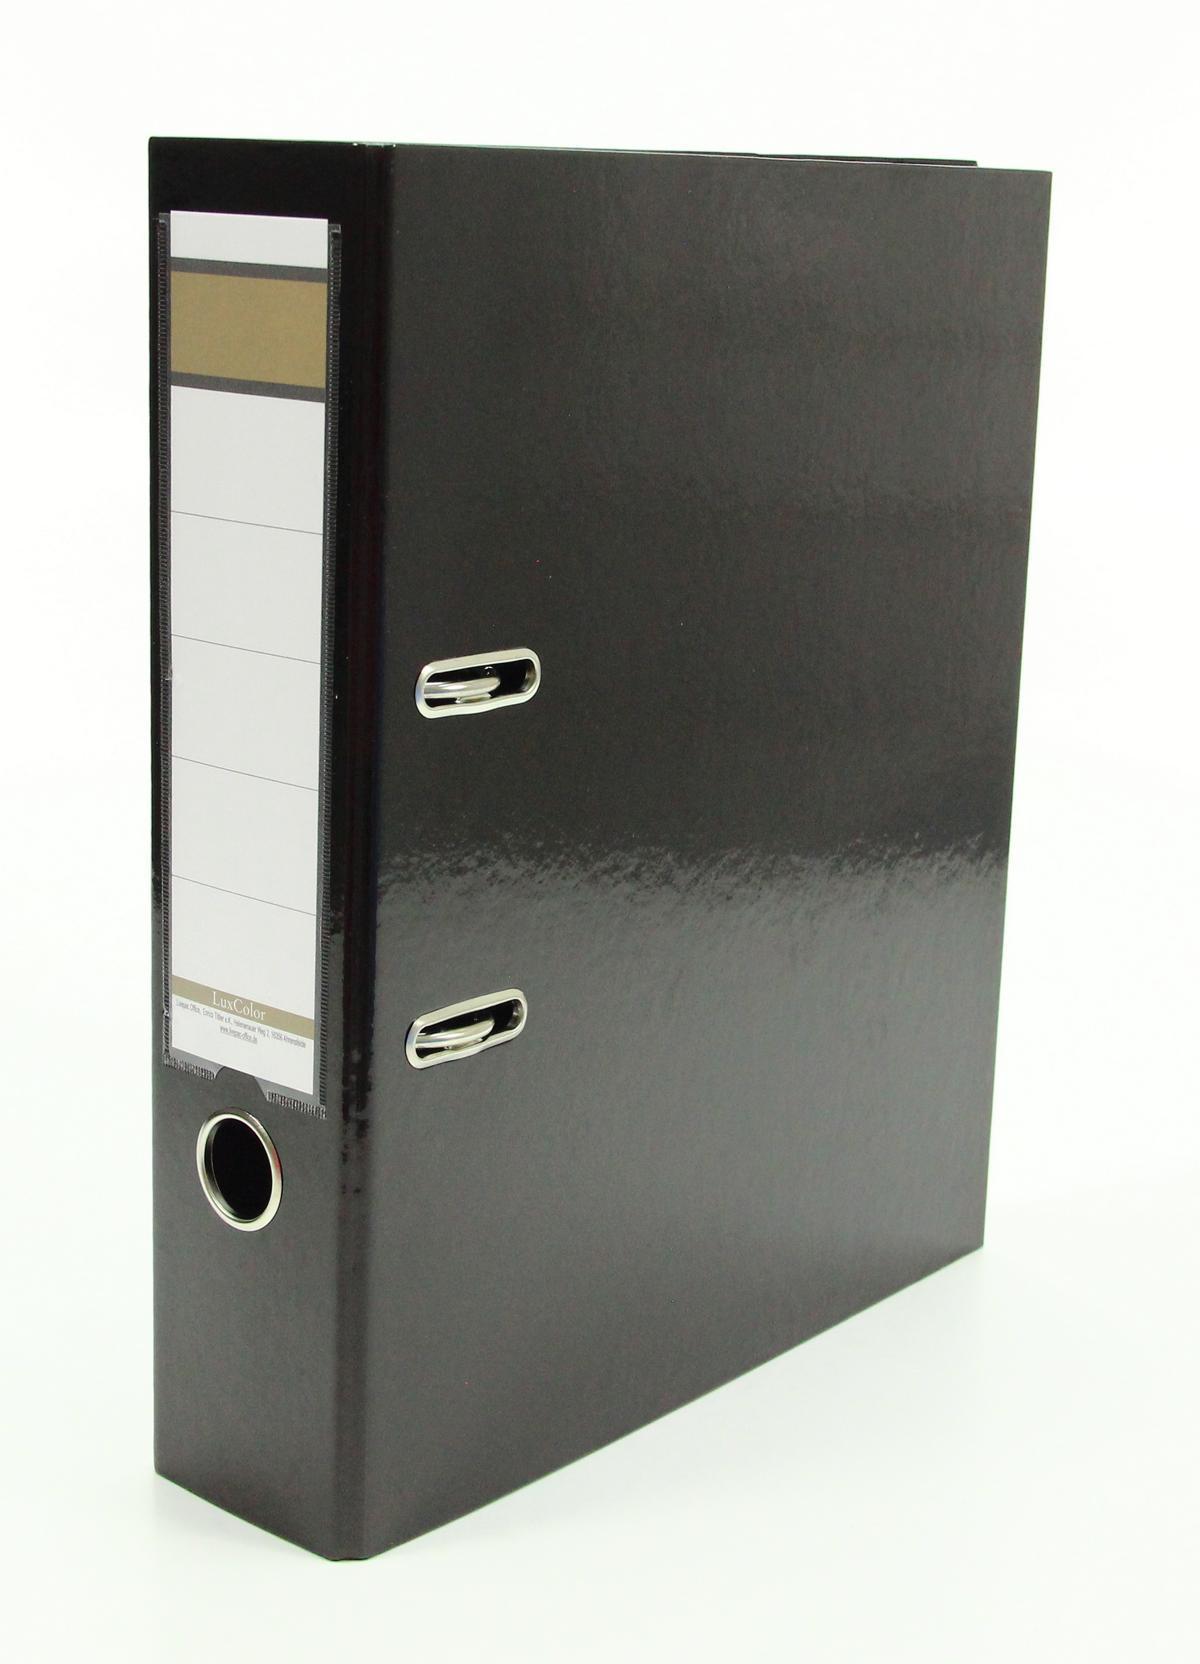 10x Livepac Caribic Glanz Ordner Din A4 75mm Breit Farbe